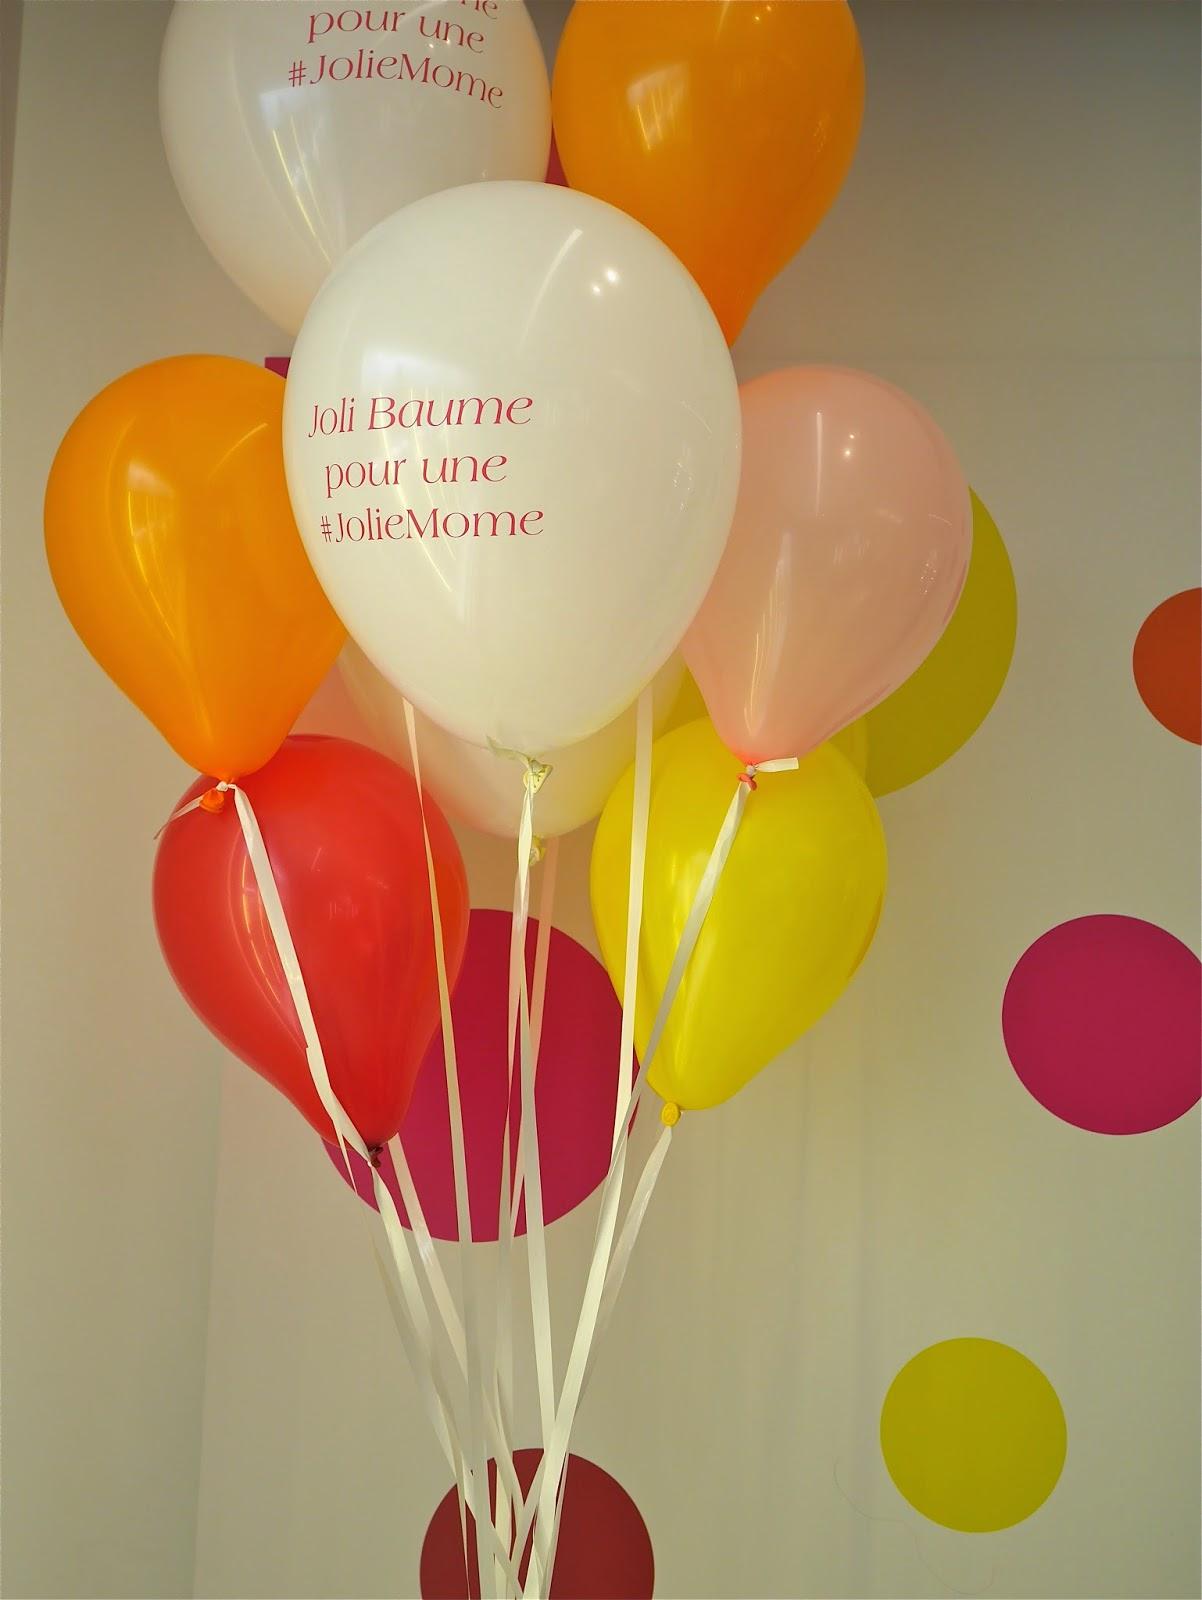 balon, event, soirée clarins, blog